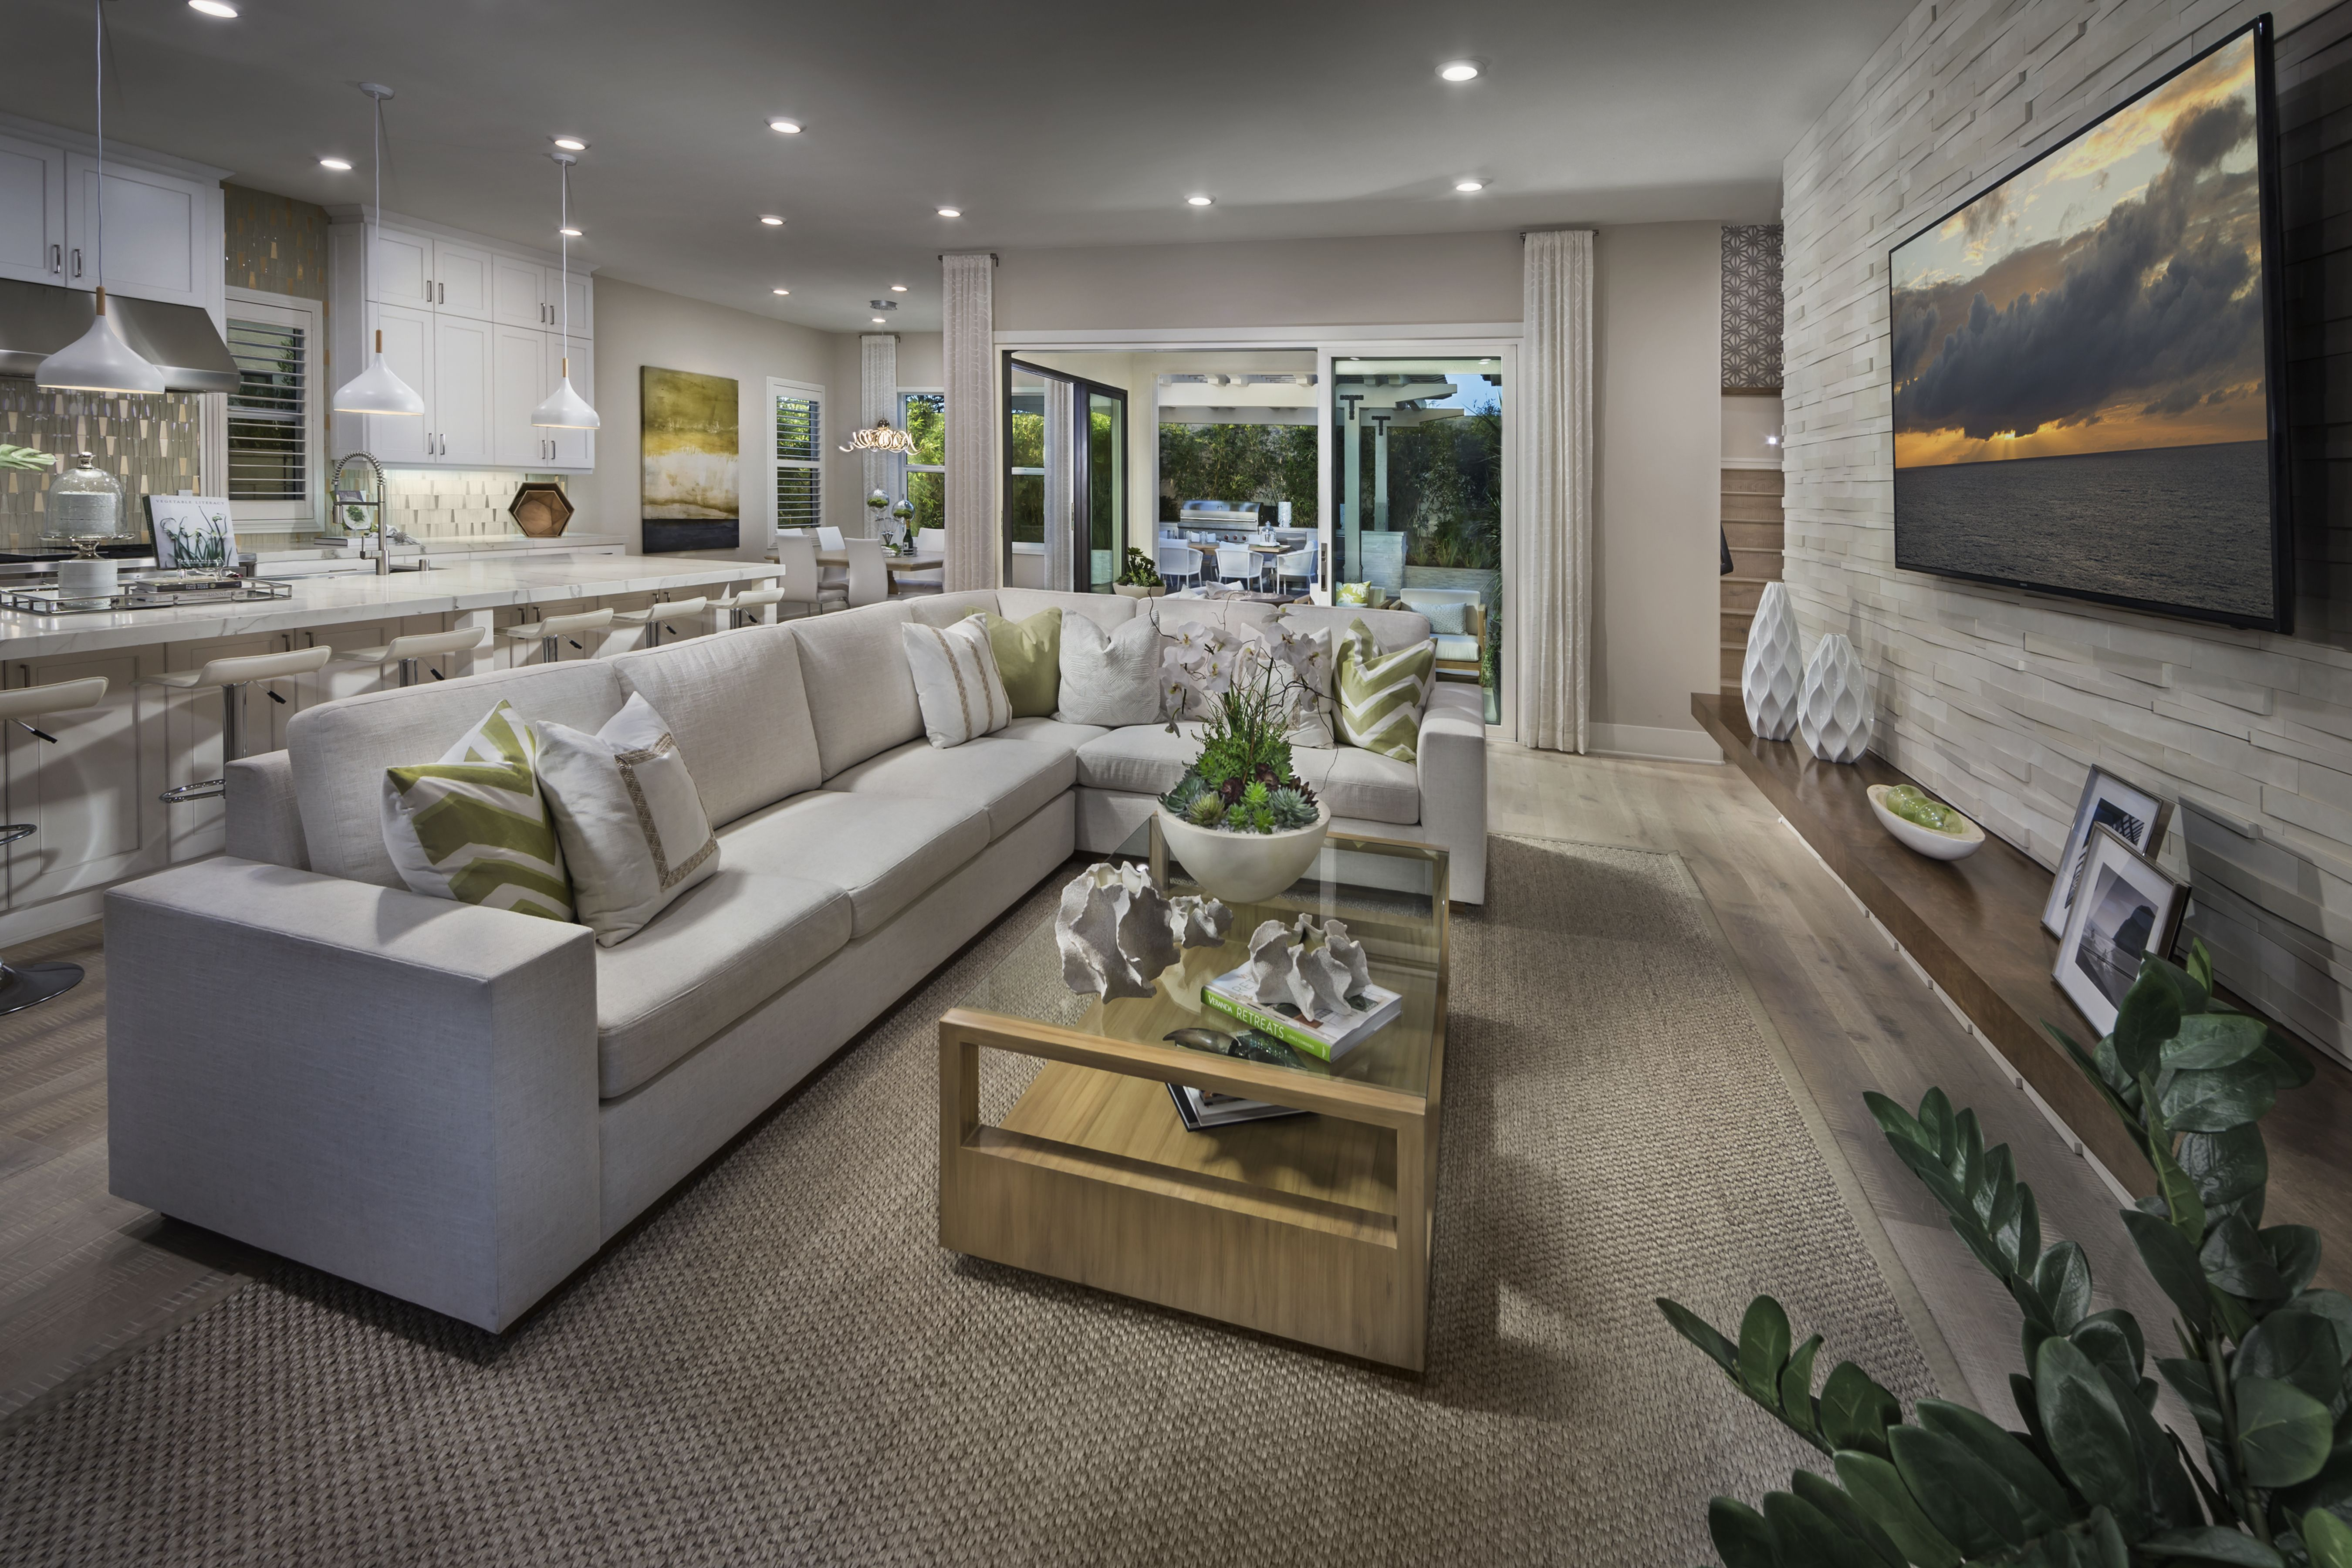 Living Room Decor New Home Communities New Homes Home